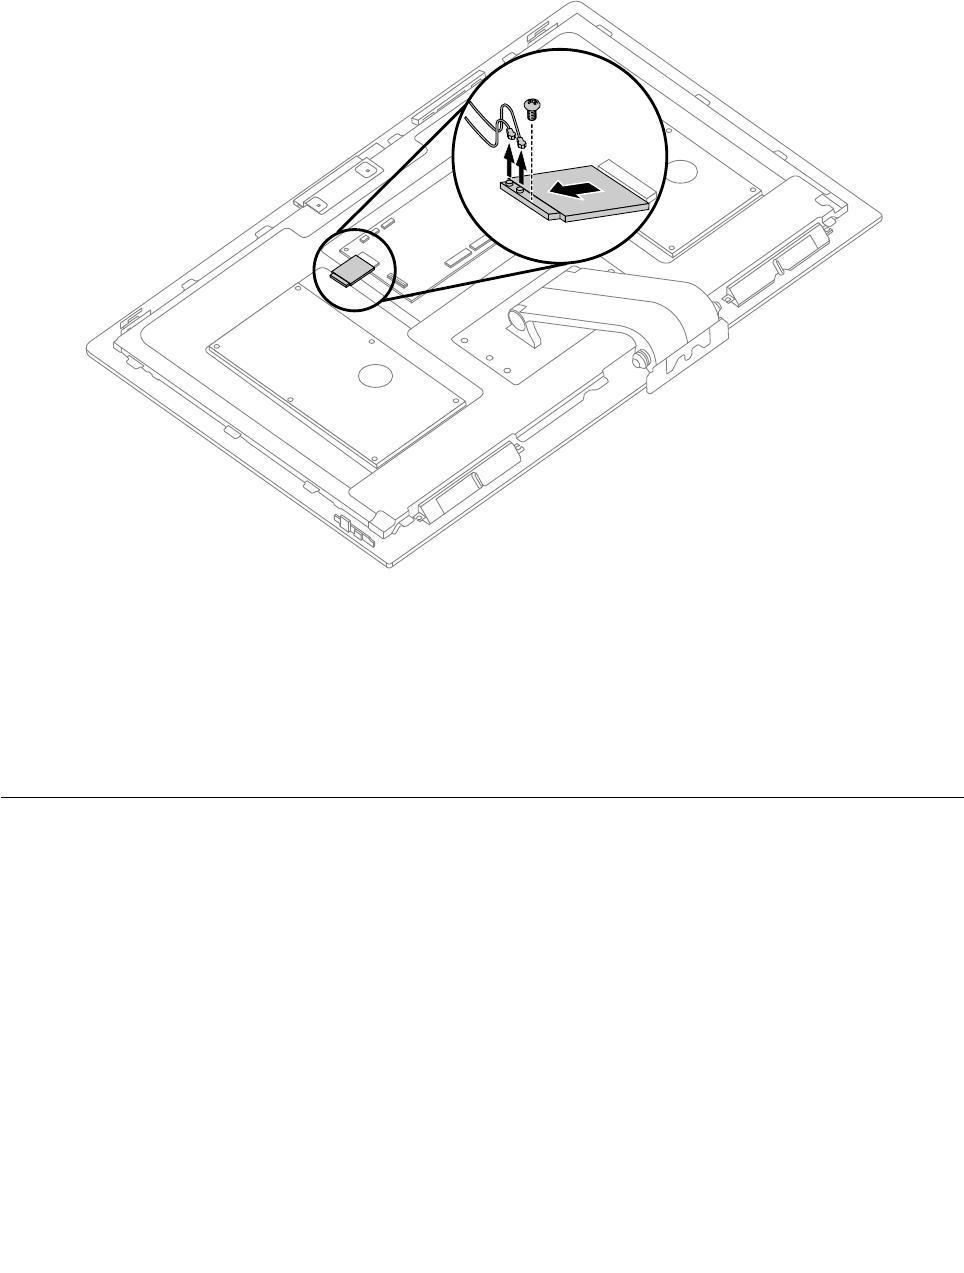 Lenovo IdeaCentre 910 Hardware Maintenance Manual Download